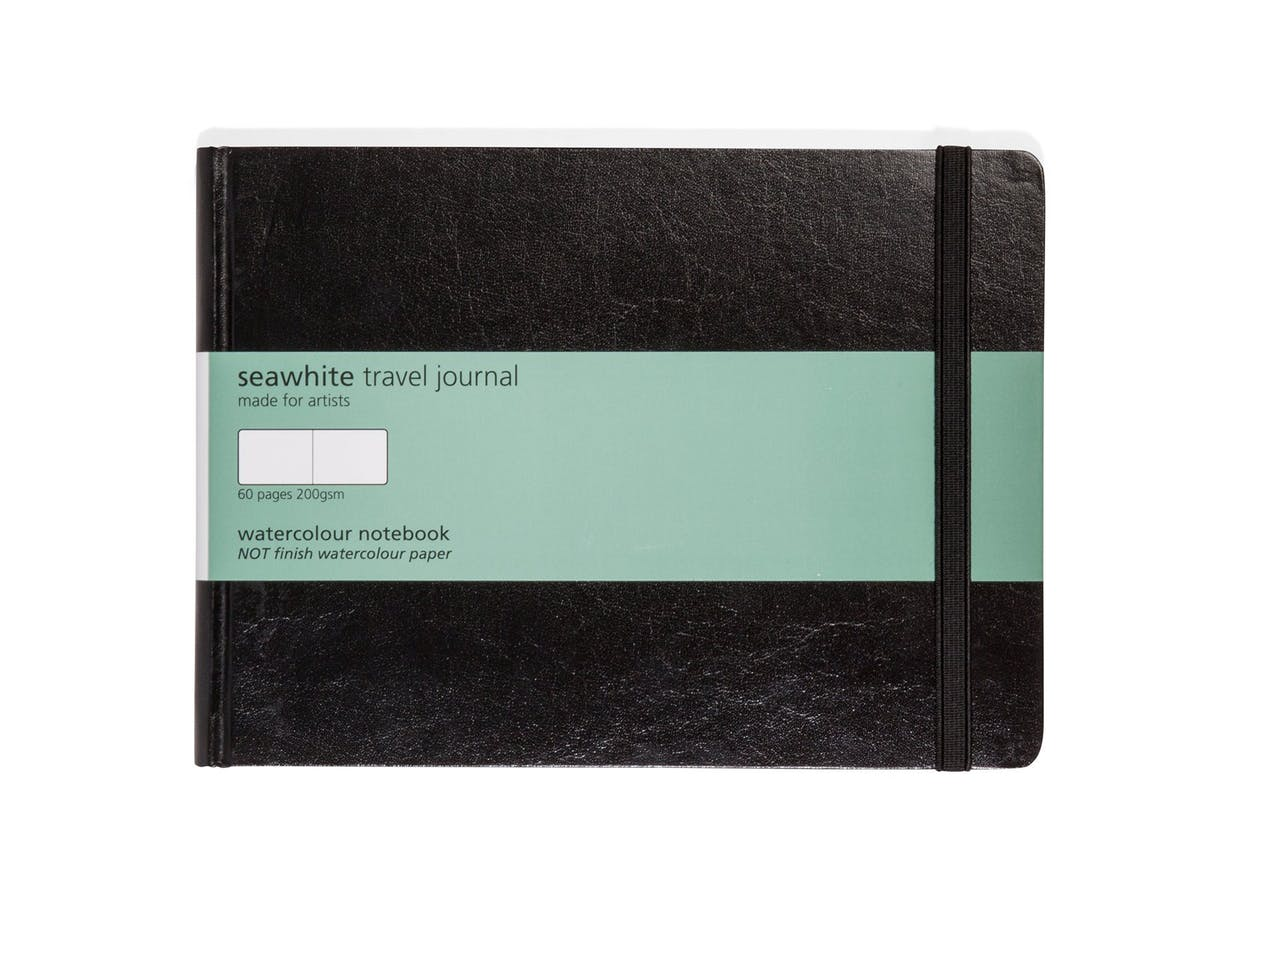 Seawhite Aquarellbuch Hardcover weiß 200 g/m², glatt, 210x148 mm, A5 QF, 30 Bl/60 S, Fadenheftung